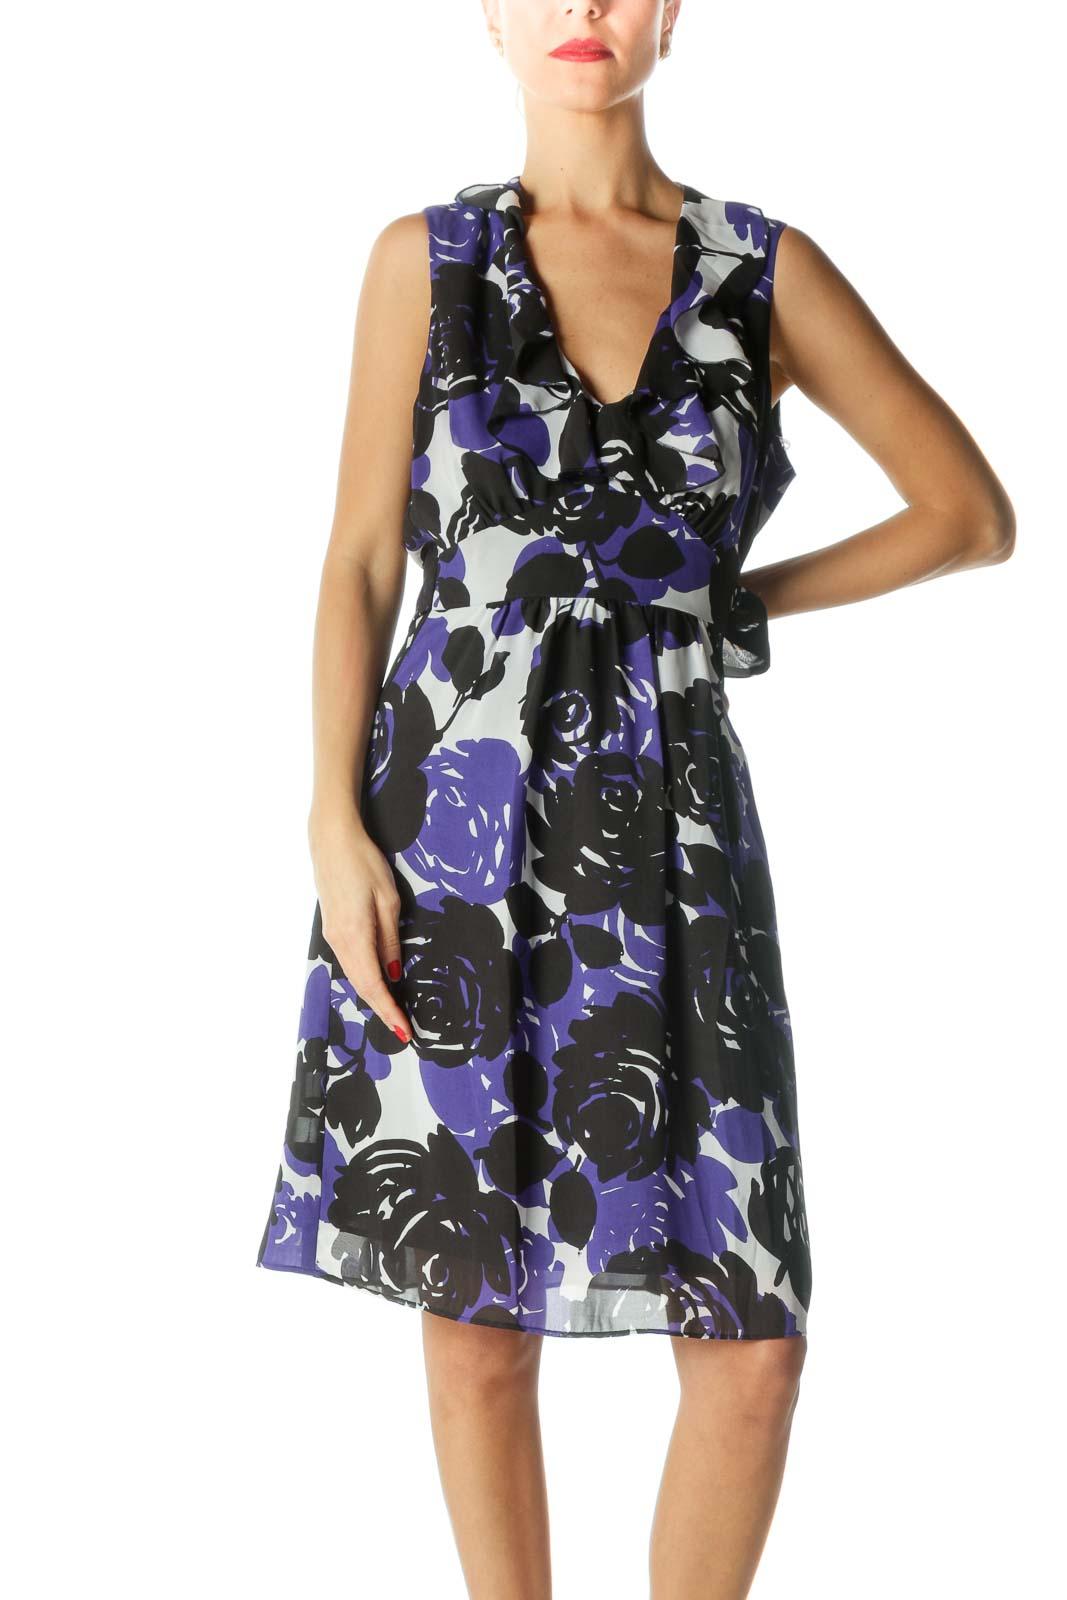 Blue Black White V-Neck Floral Print Flared Dress